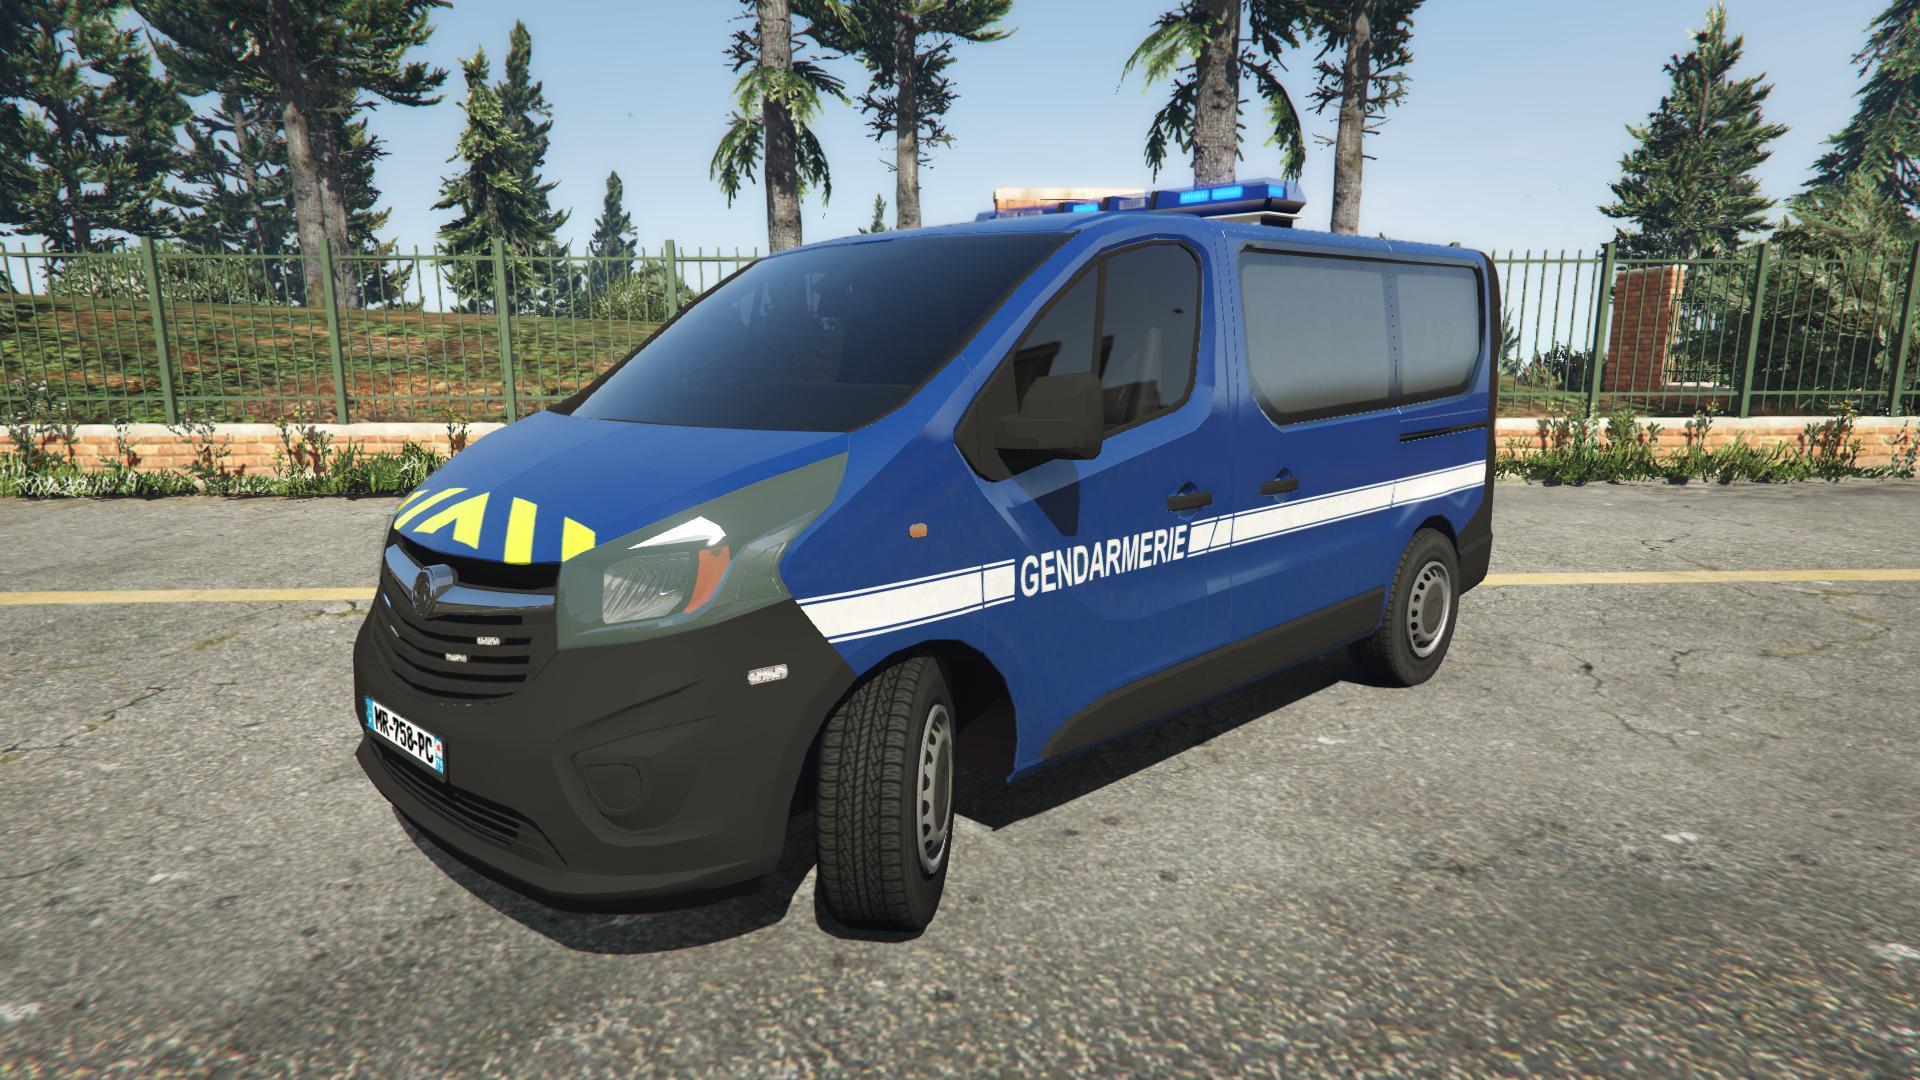 opel vivaro gendarmerie nationale vehicules pour gta v sur gta modding. Black Bedroom Furniture Sets. Home Design Ideas